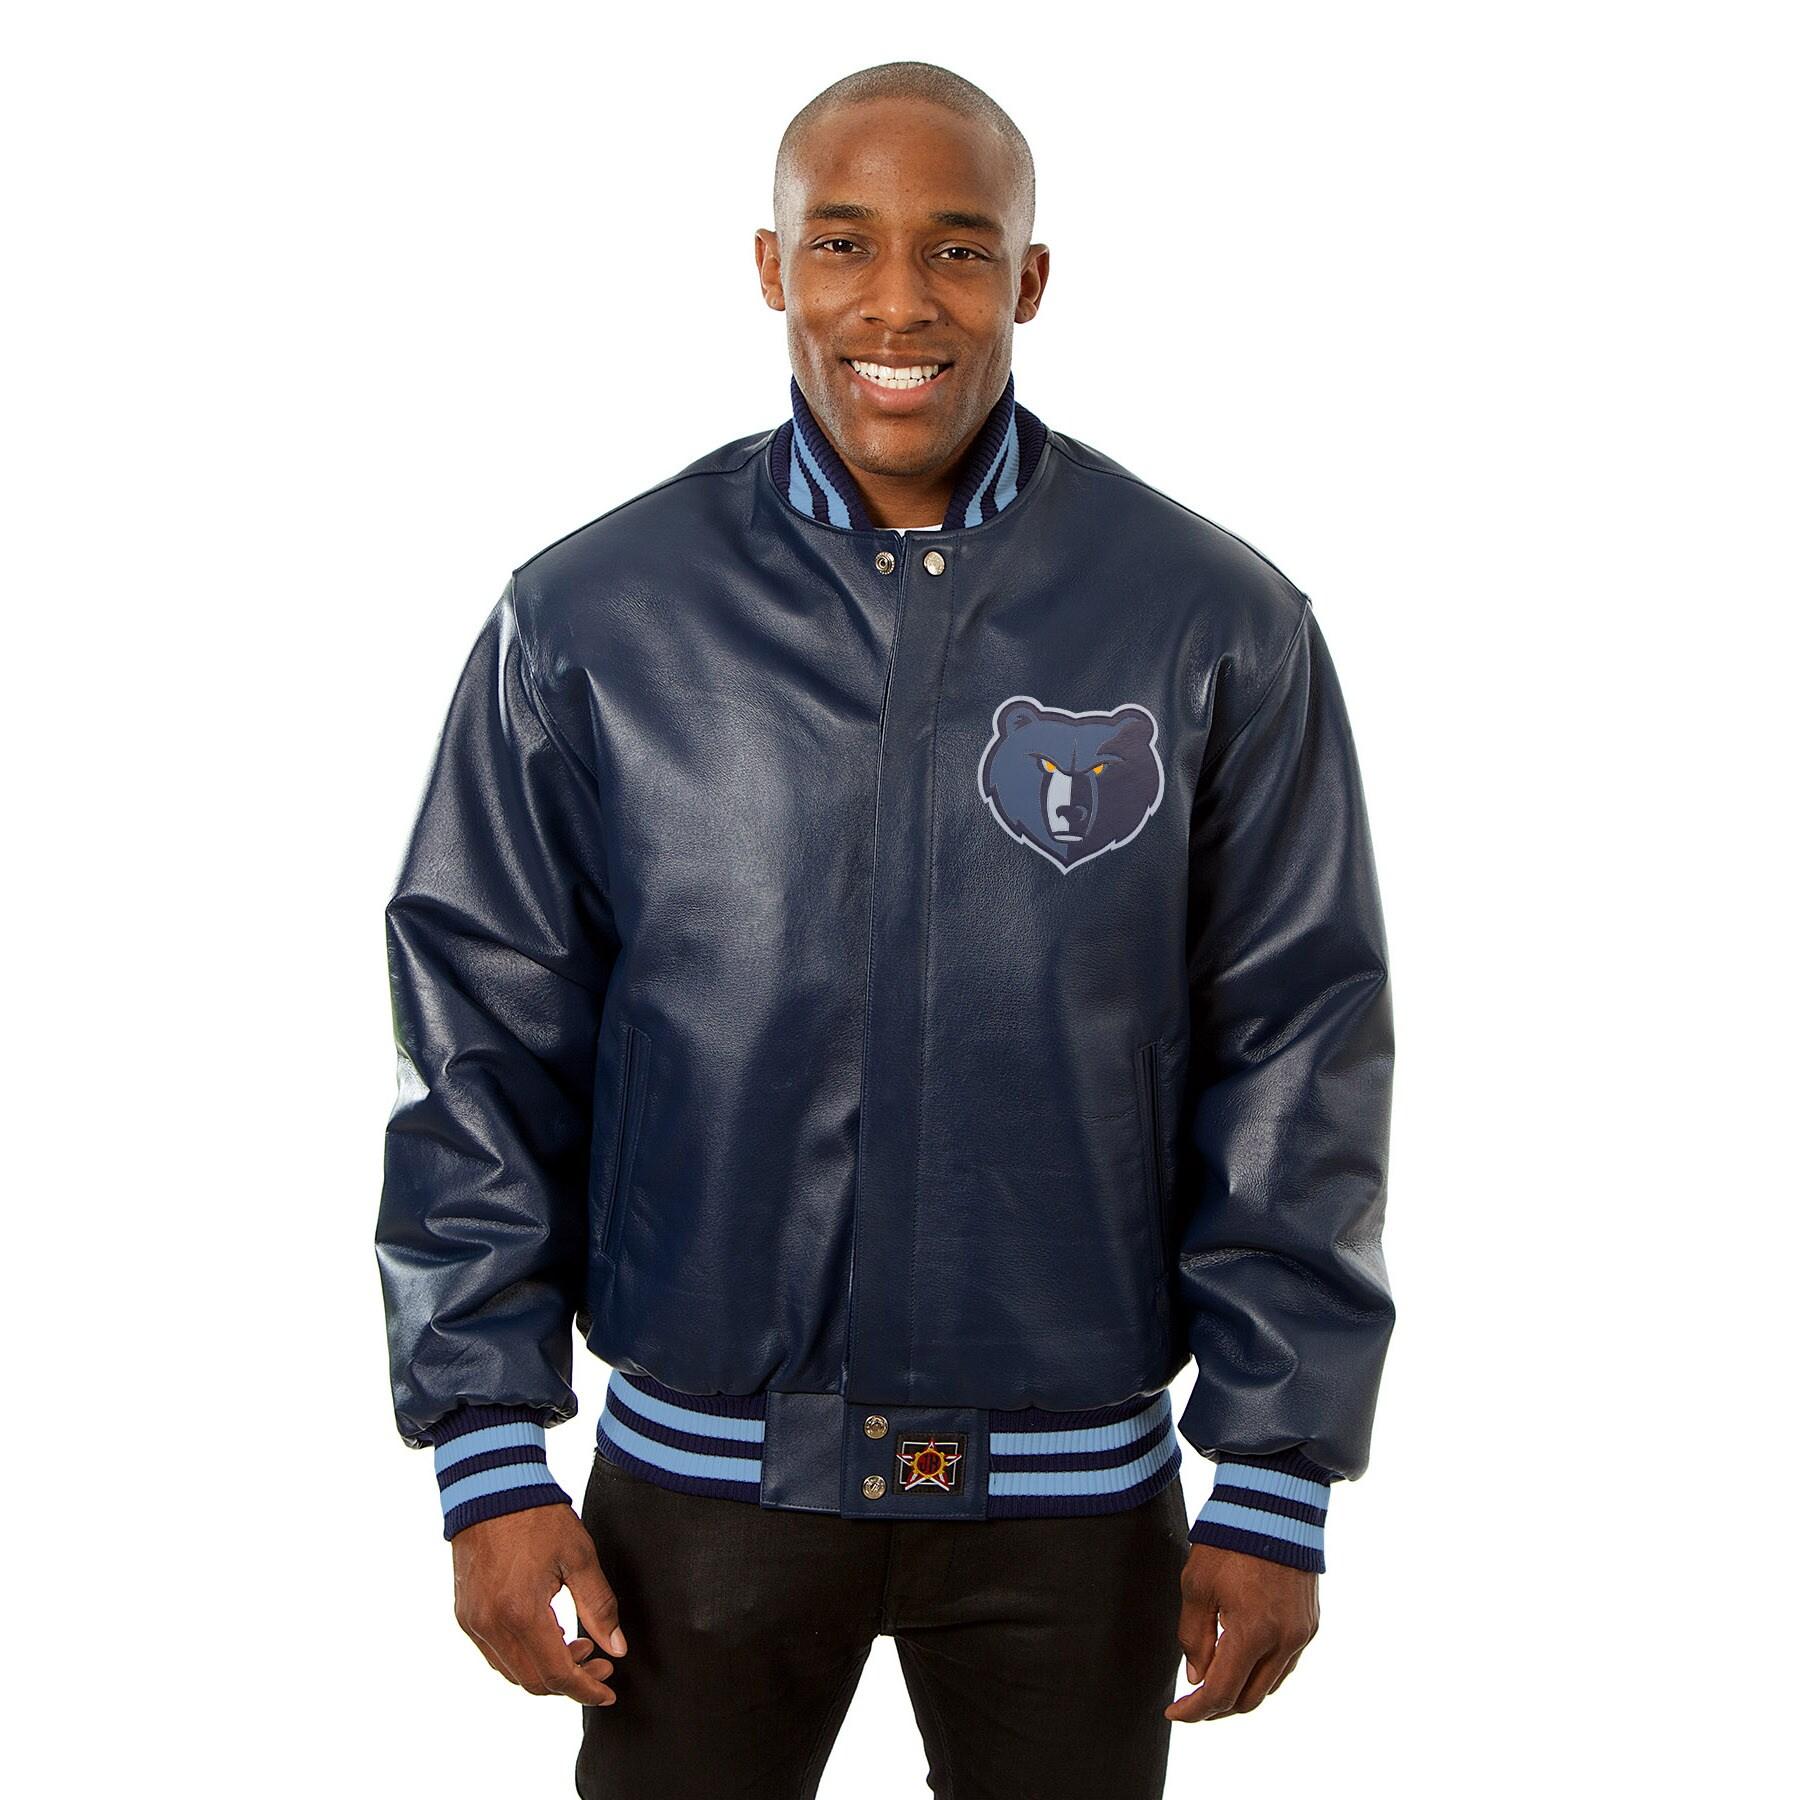 Memphis Grizzlies JH Design Domestic Team Color Leather Jacket - Navy